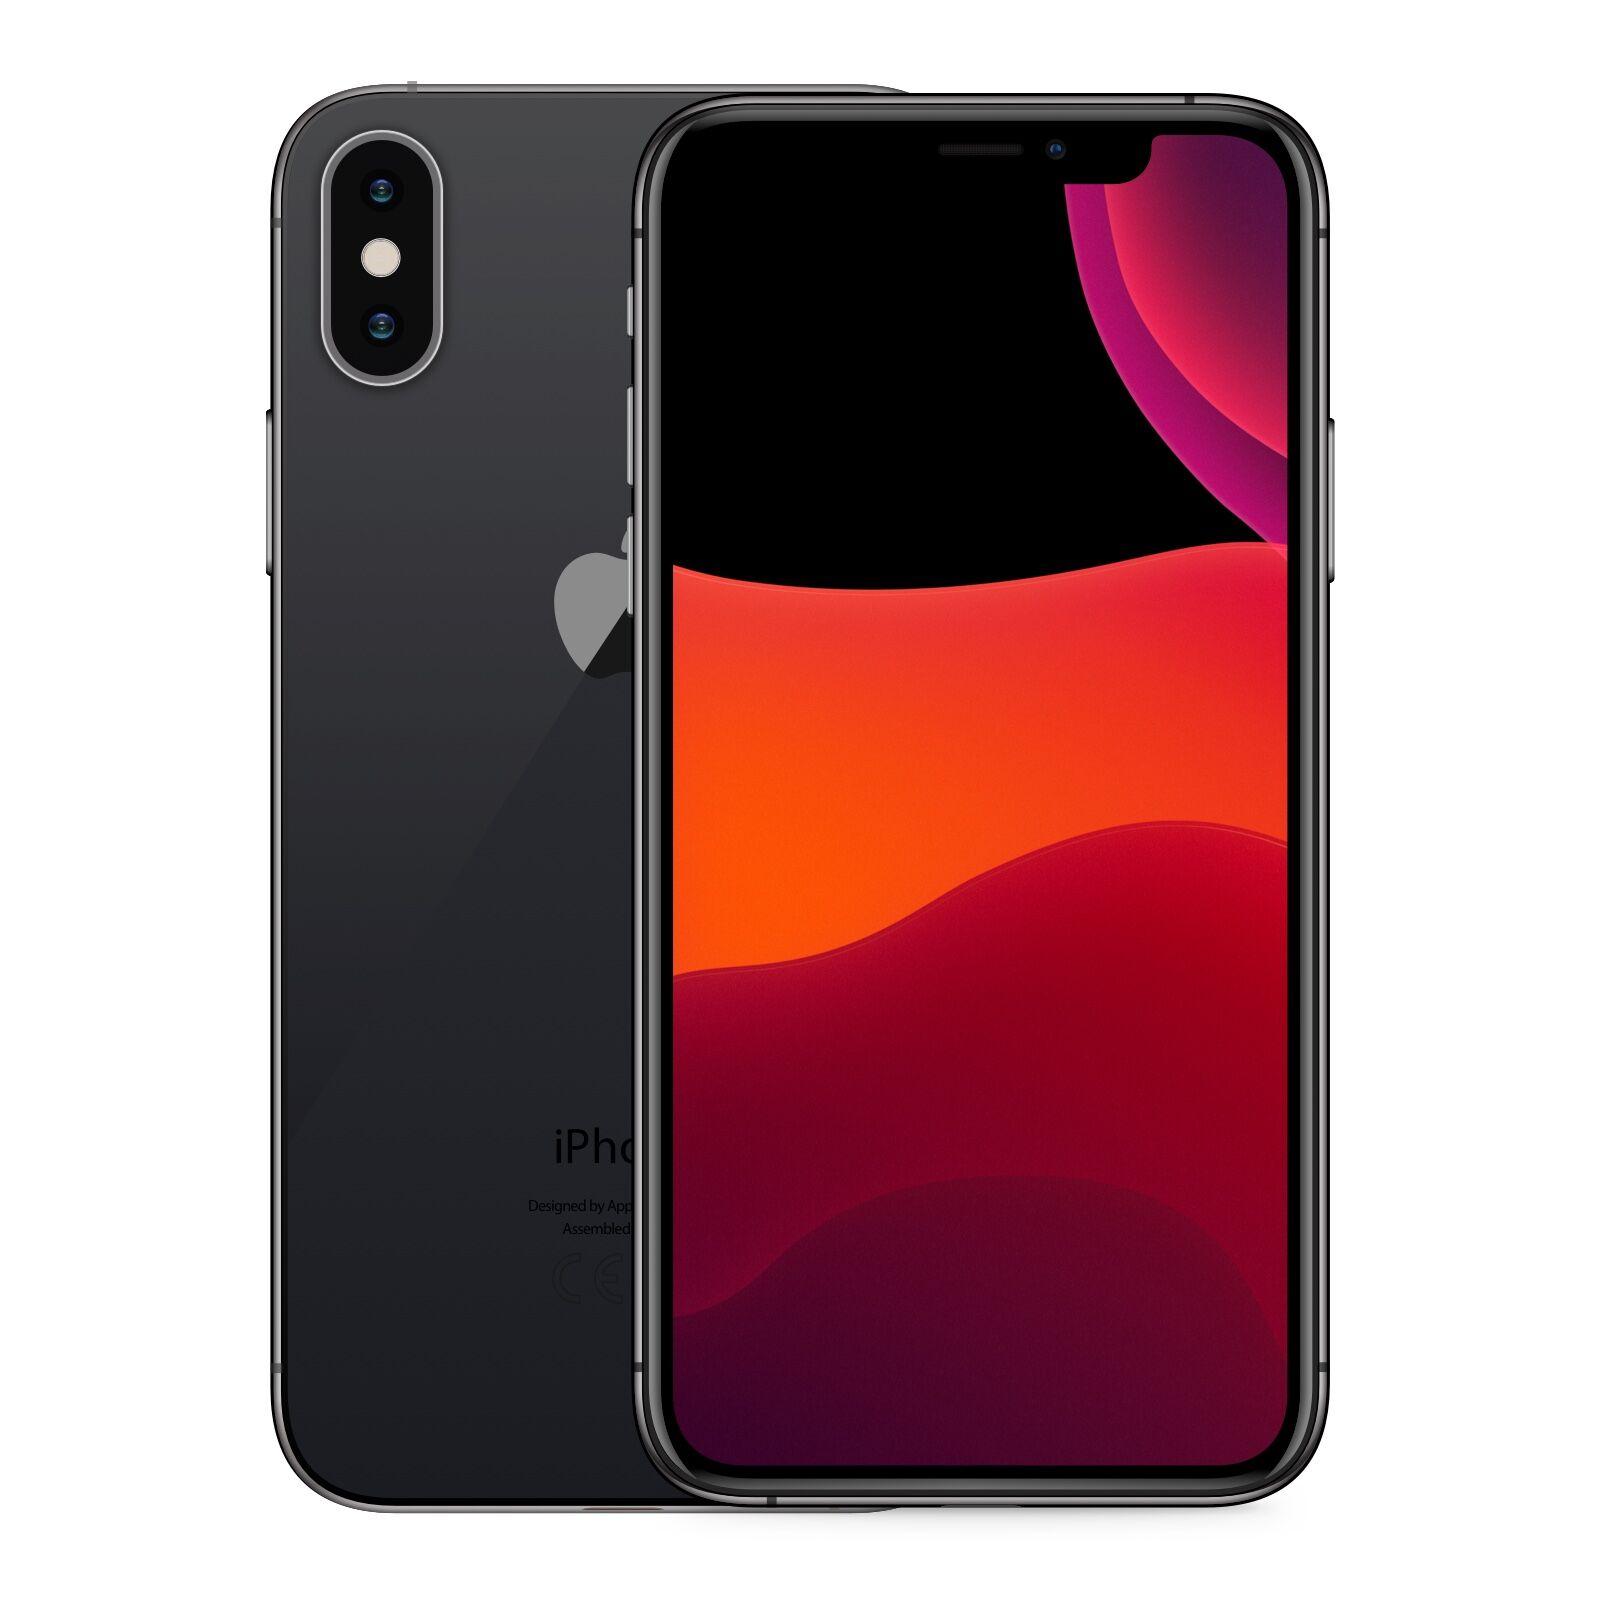 Apple iPhone XS Max 256GB Rymdgrå Klass: A